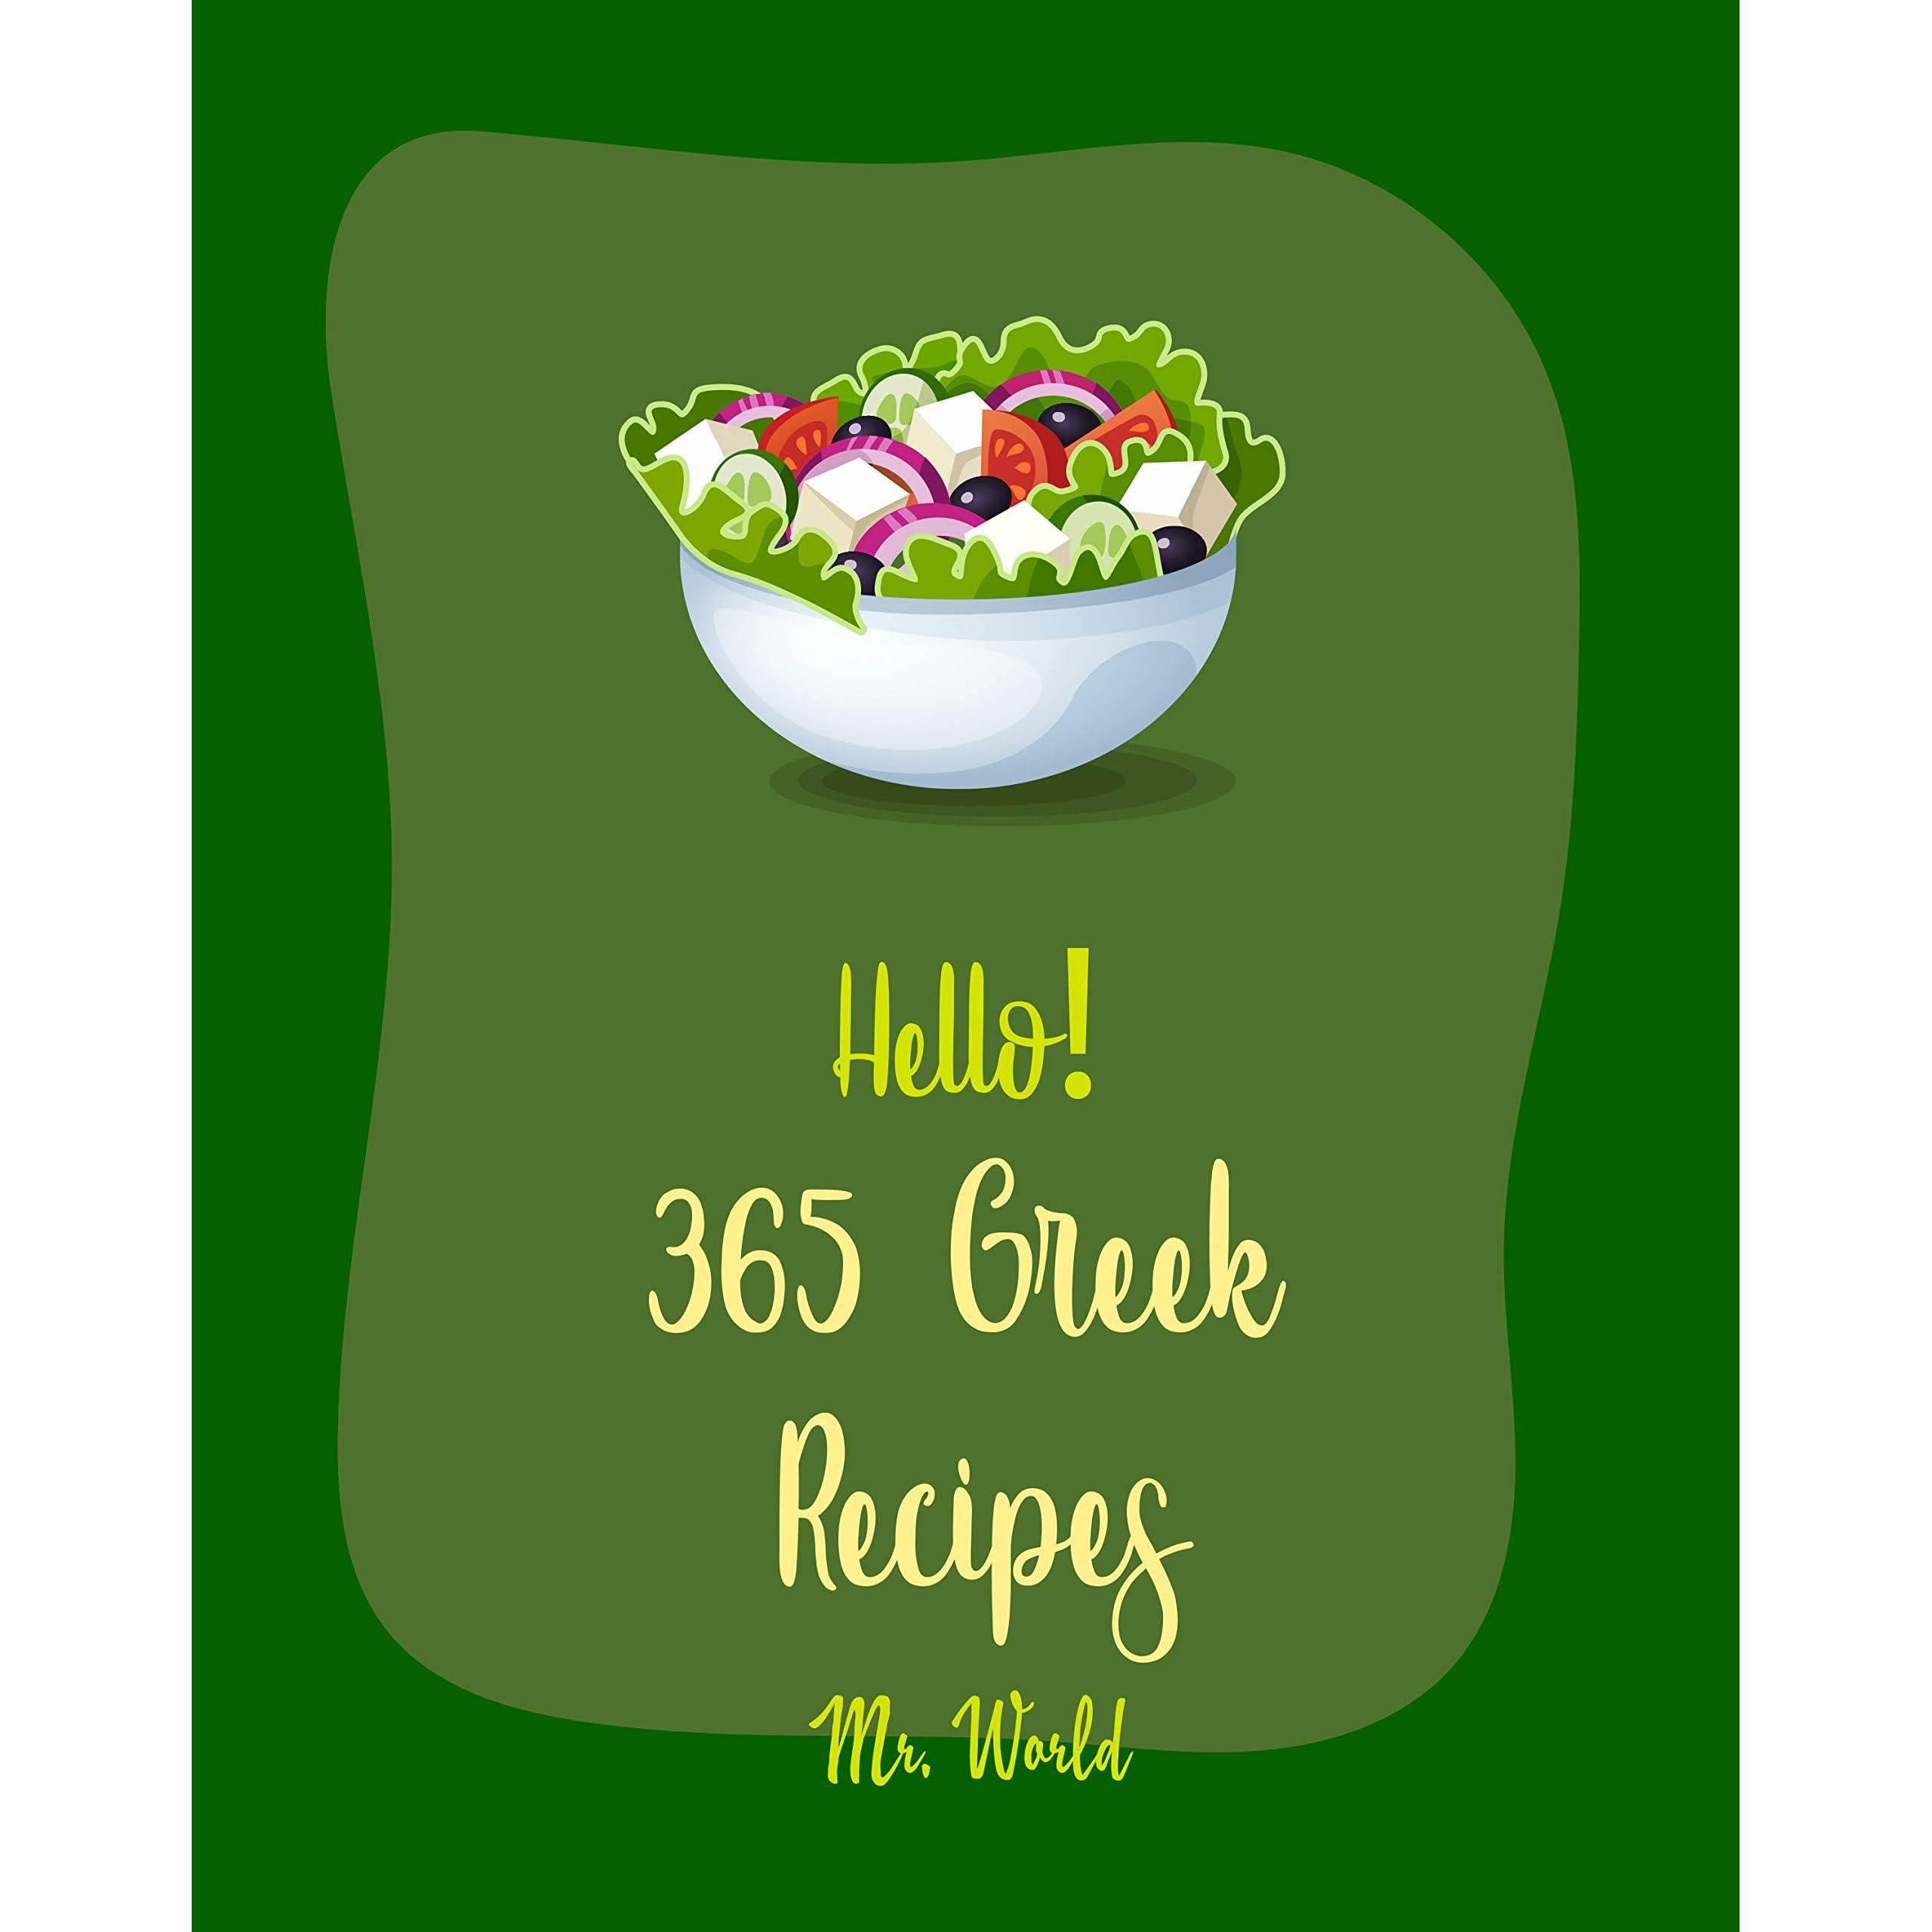 Hello 365 Greek Recipes Best Greek Cookbook Ever For Beginners Slow Cooker Greek Recipes Greek Desserts Cookbook Greek Yogurt Cookbook Mediterranean Fish Cookbook Salmon Salad Recipe Book 1 By Mr Walls